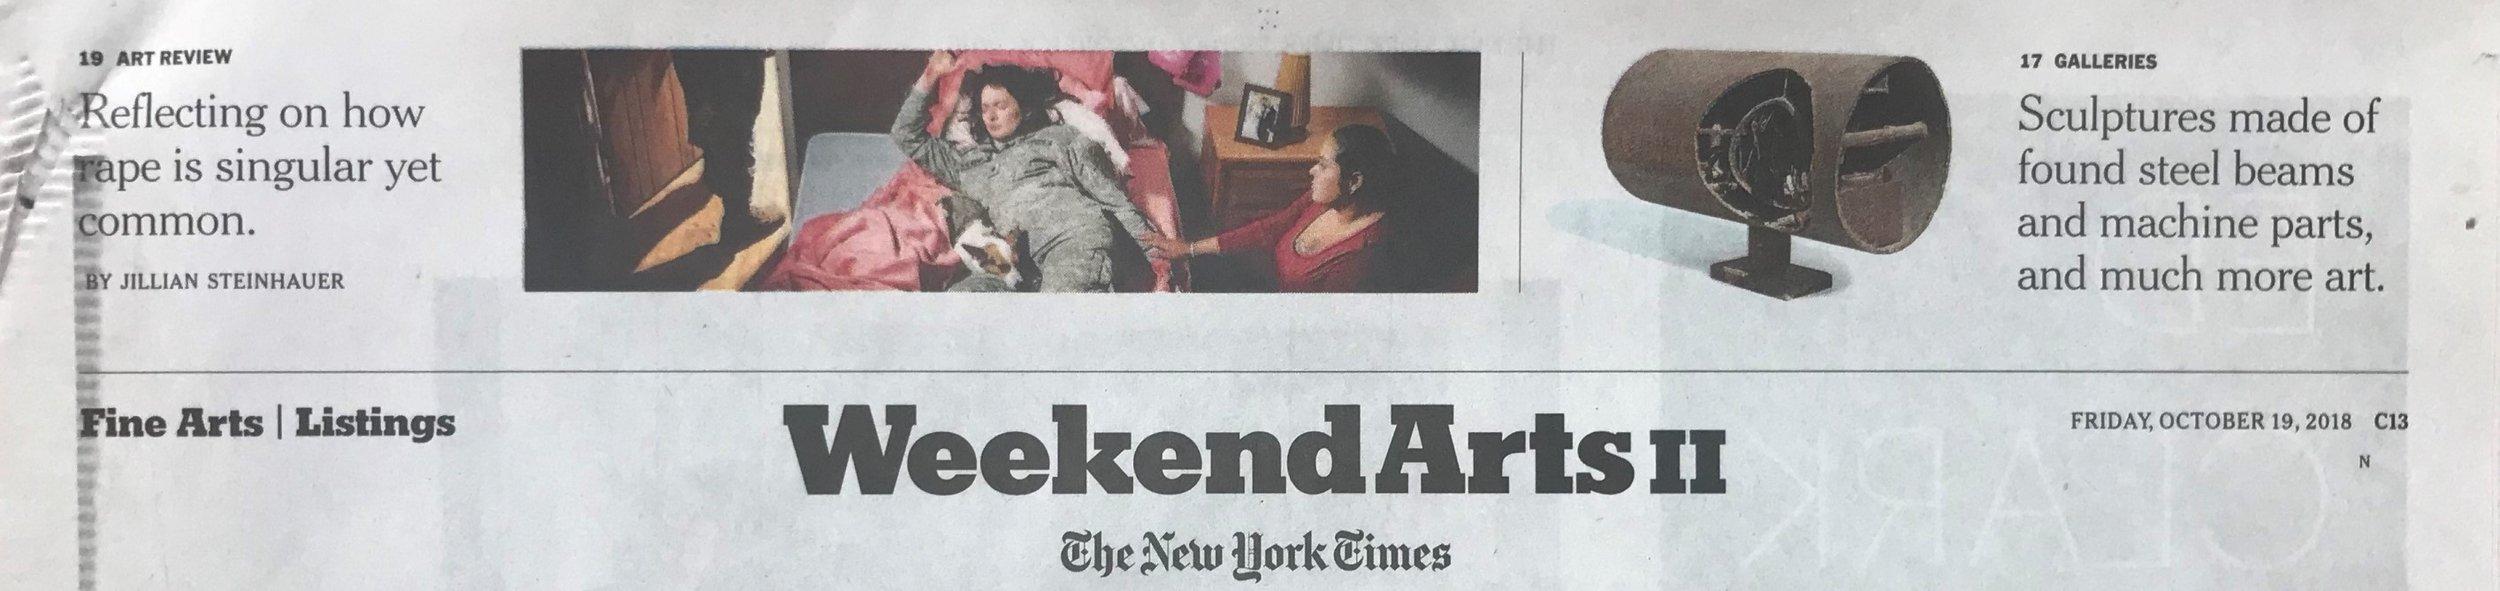 NYT composite part 1A.jpg